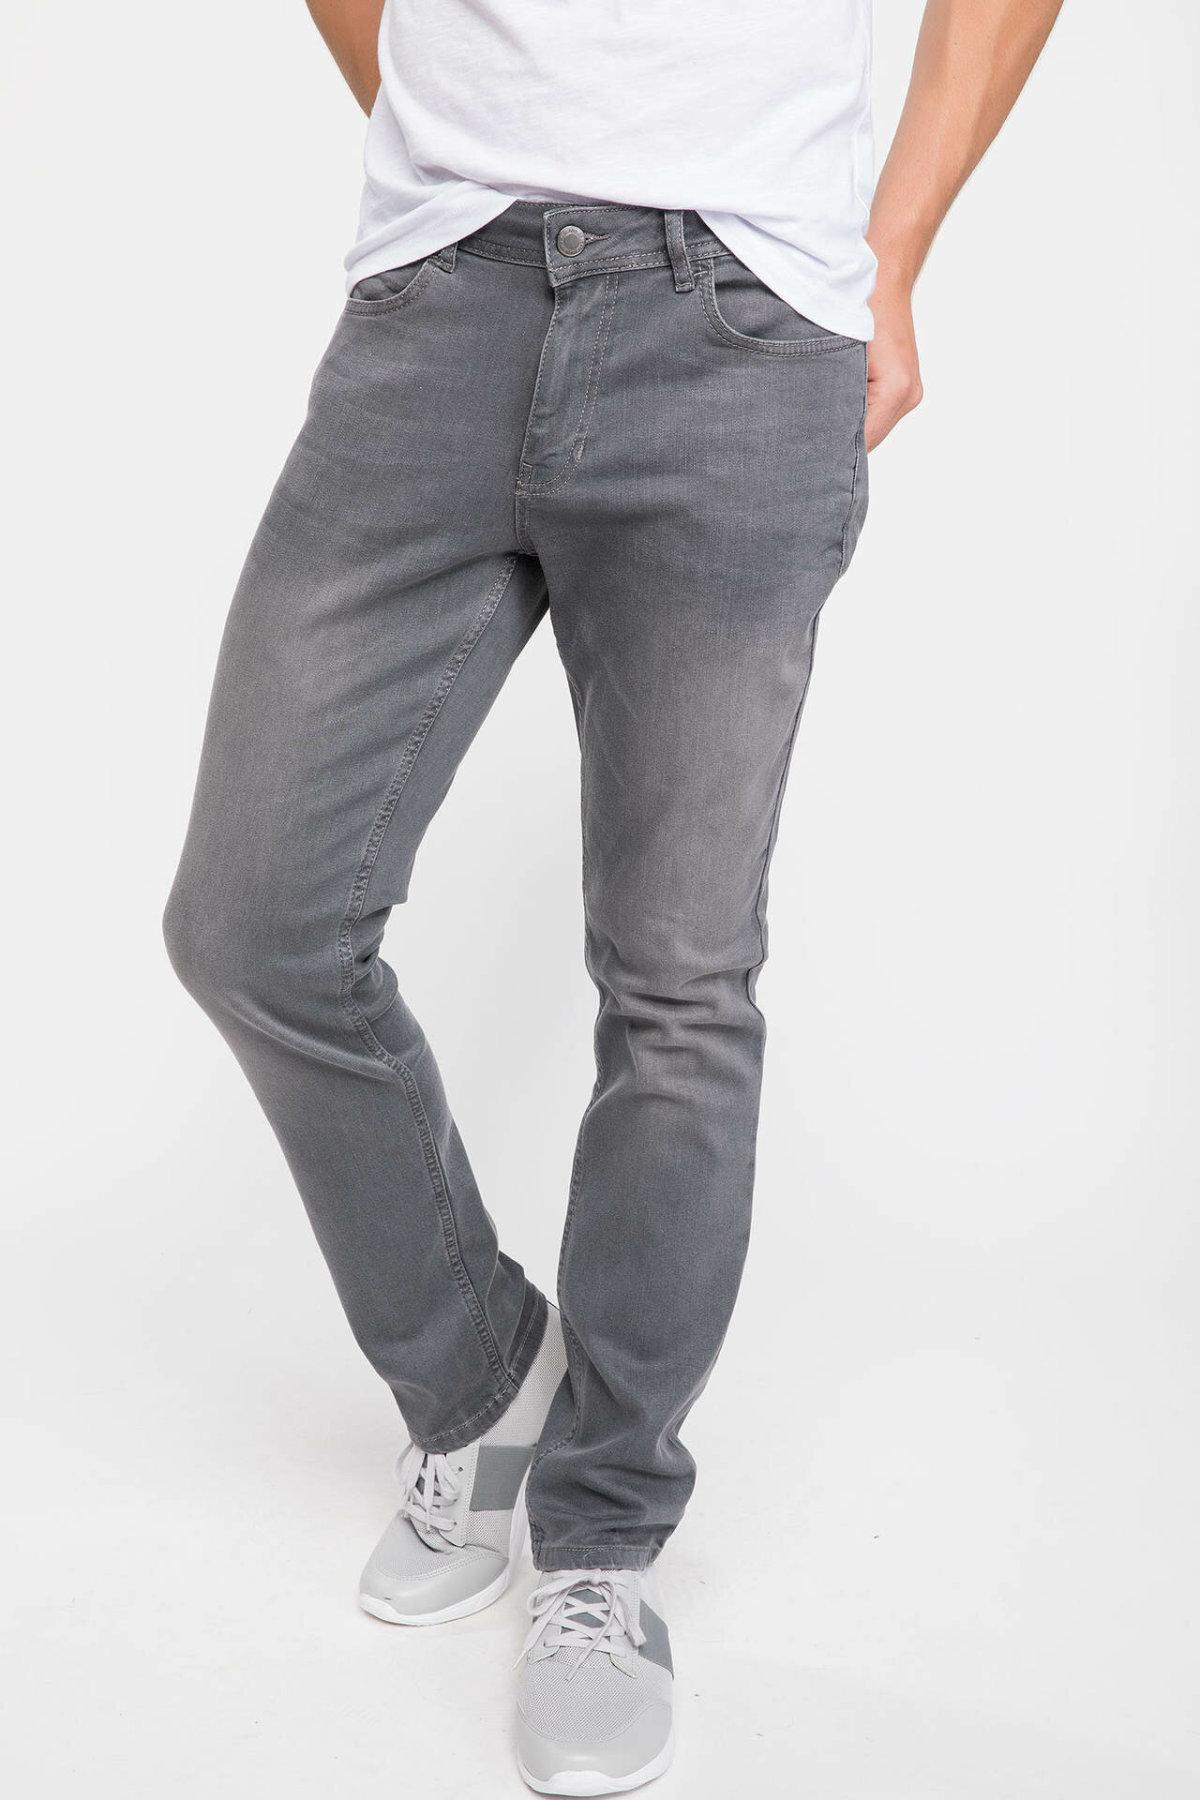 DeFacto Man Autumn Fashion Jeans Trousers For Men's Casual Smoke Gray Long Pants Male Leisure High Quality Pants - J4553AZ18AU